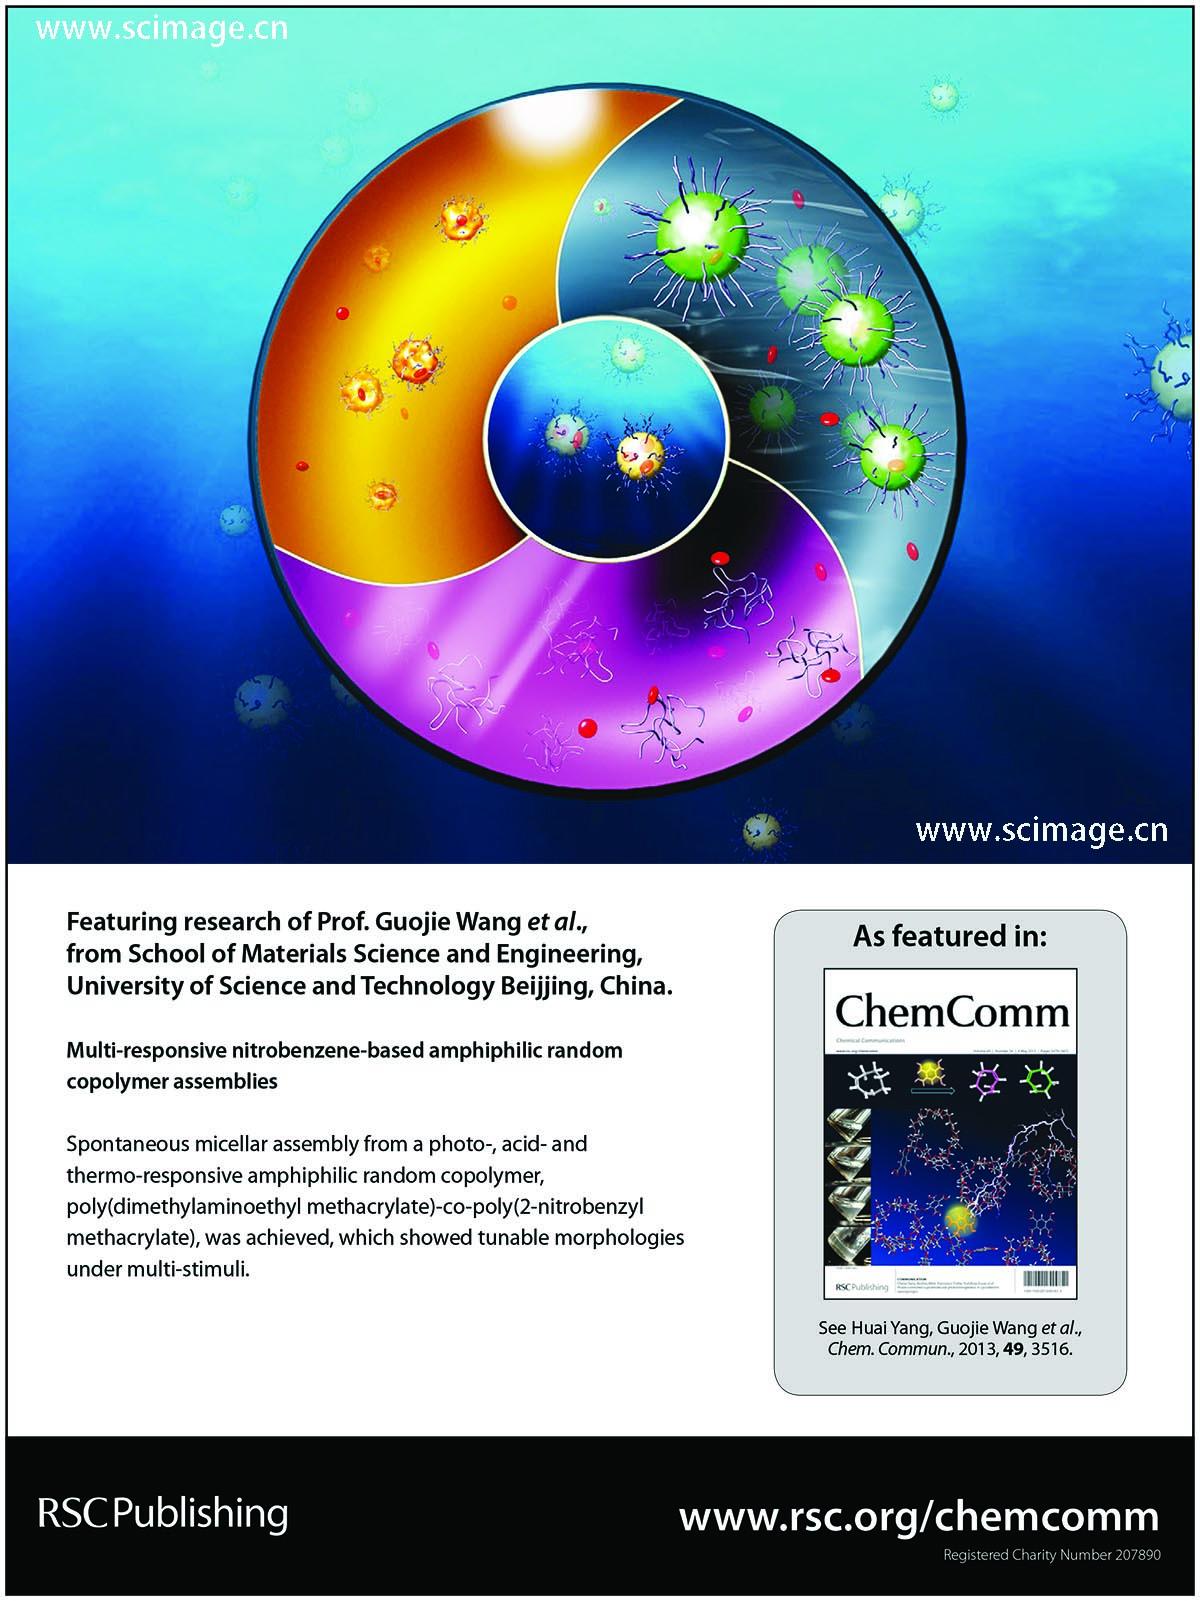 Multi-responsive nitrobenzene-based amphiphilic random copolymer assemblies